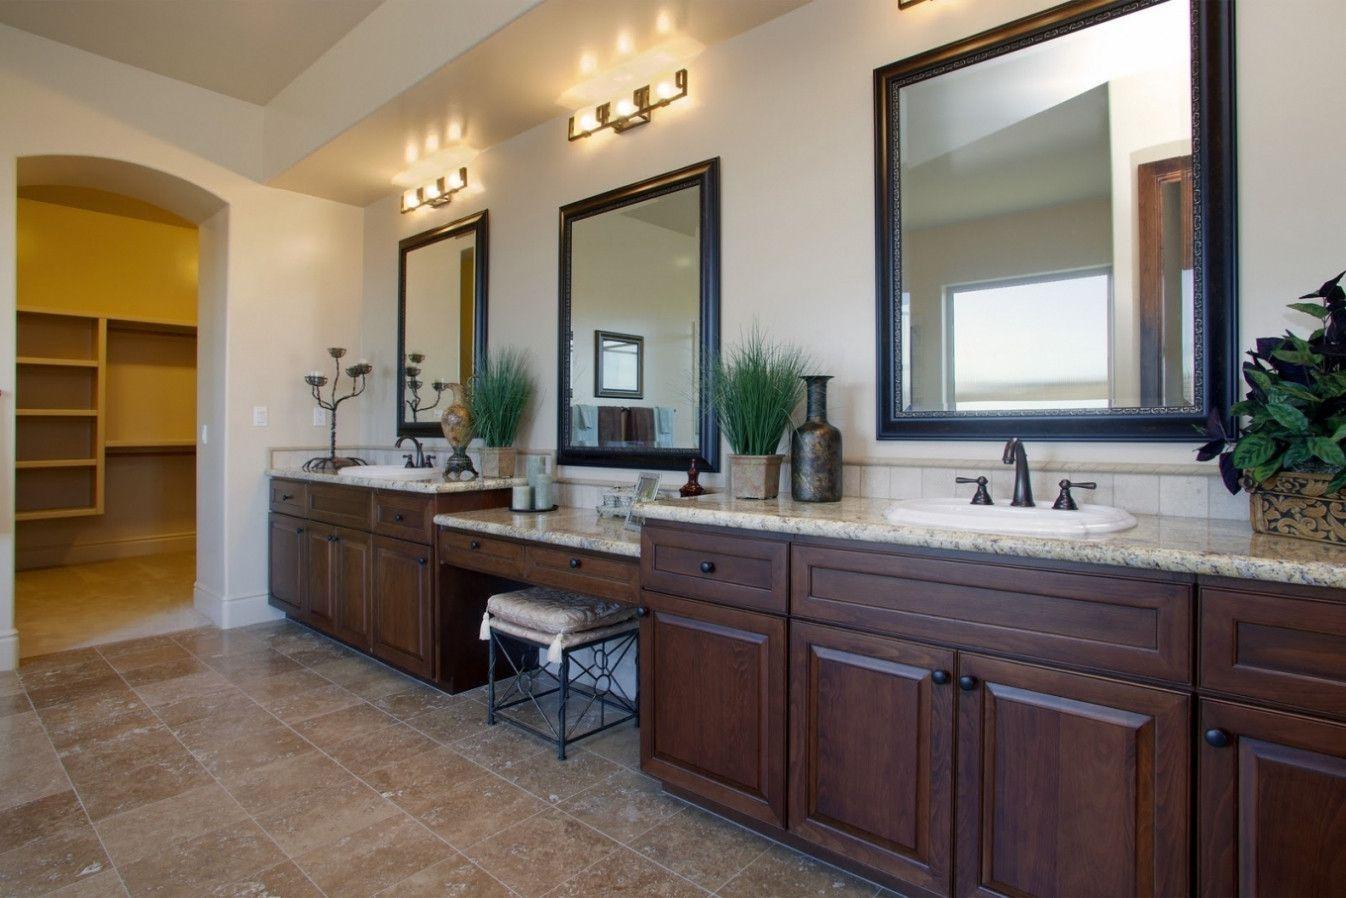 bathroom cabinets san diego. 2019 Bathroom Cabinets San Diego - Kitchen Storage Ideas Check More At Http:/ T